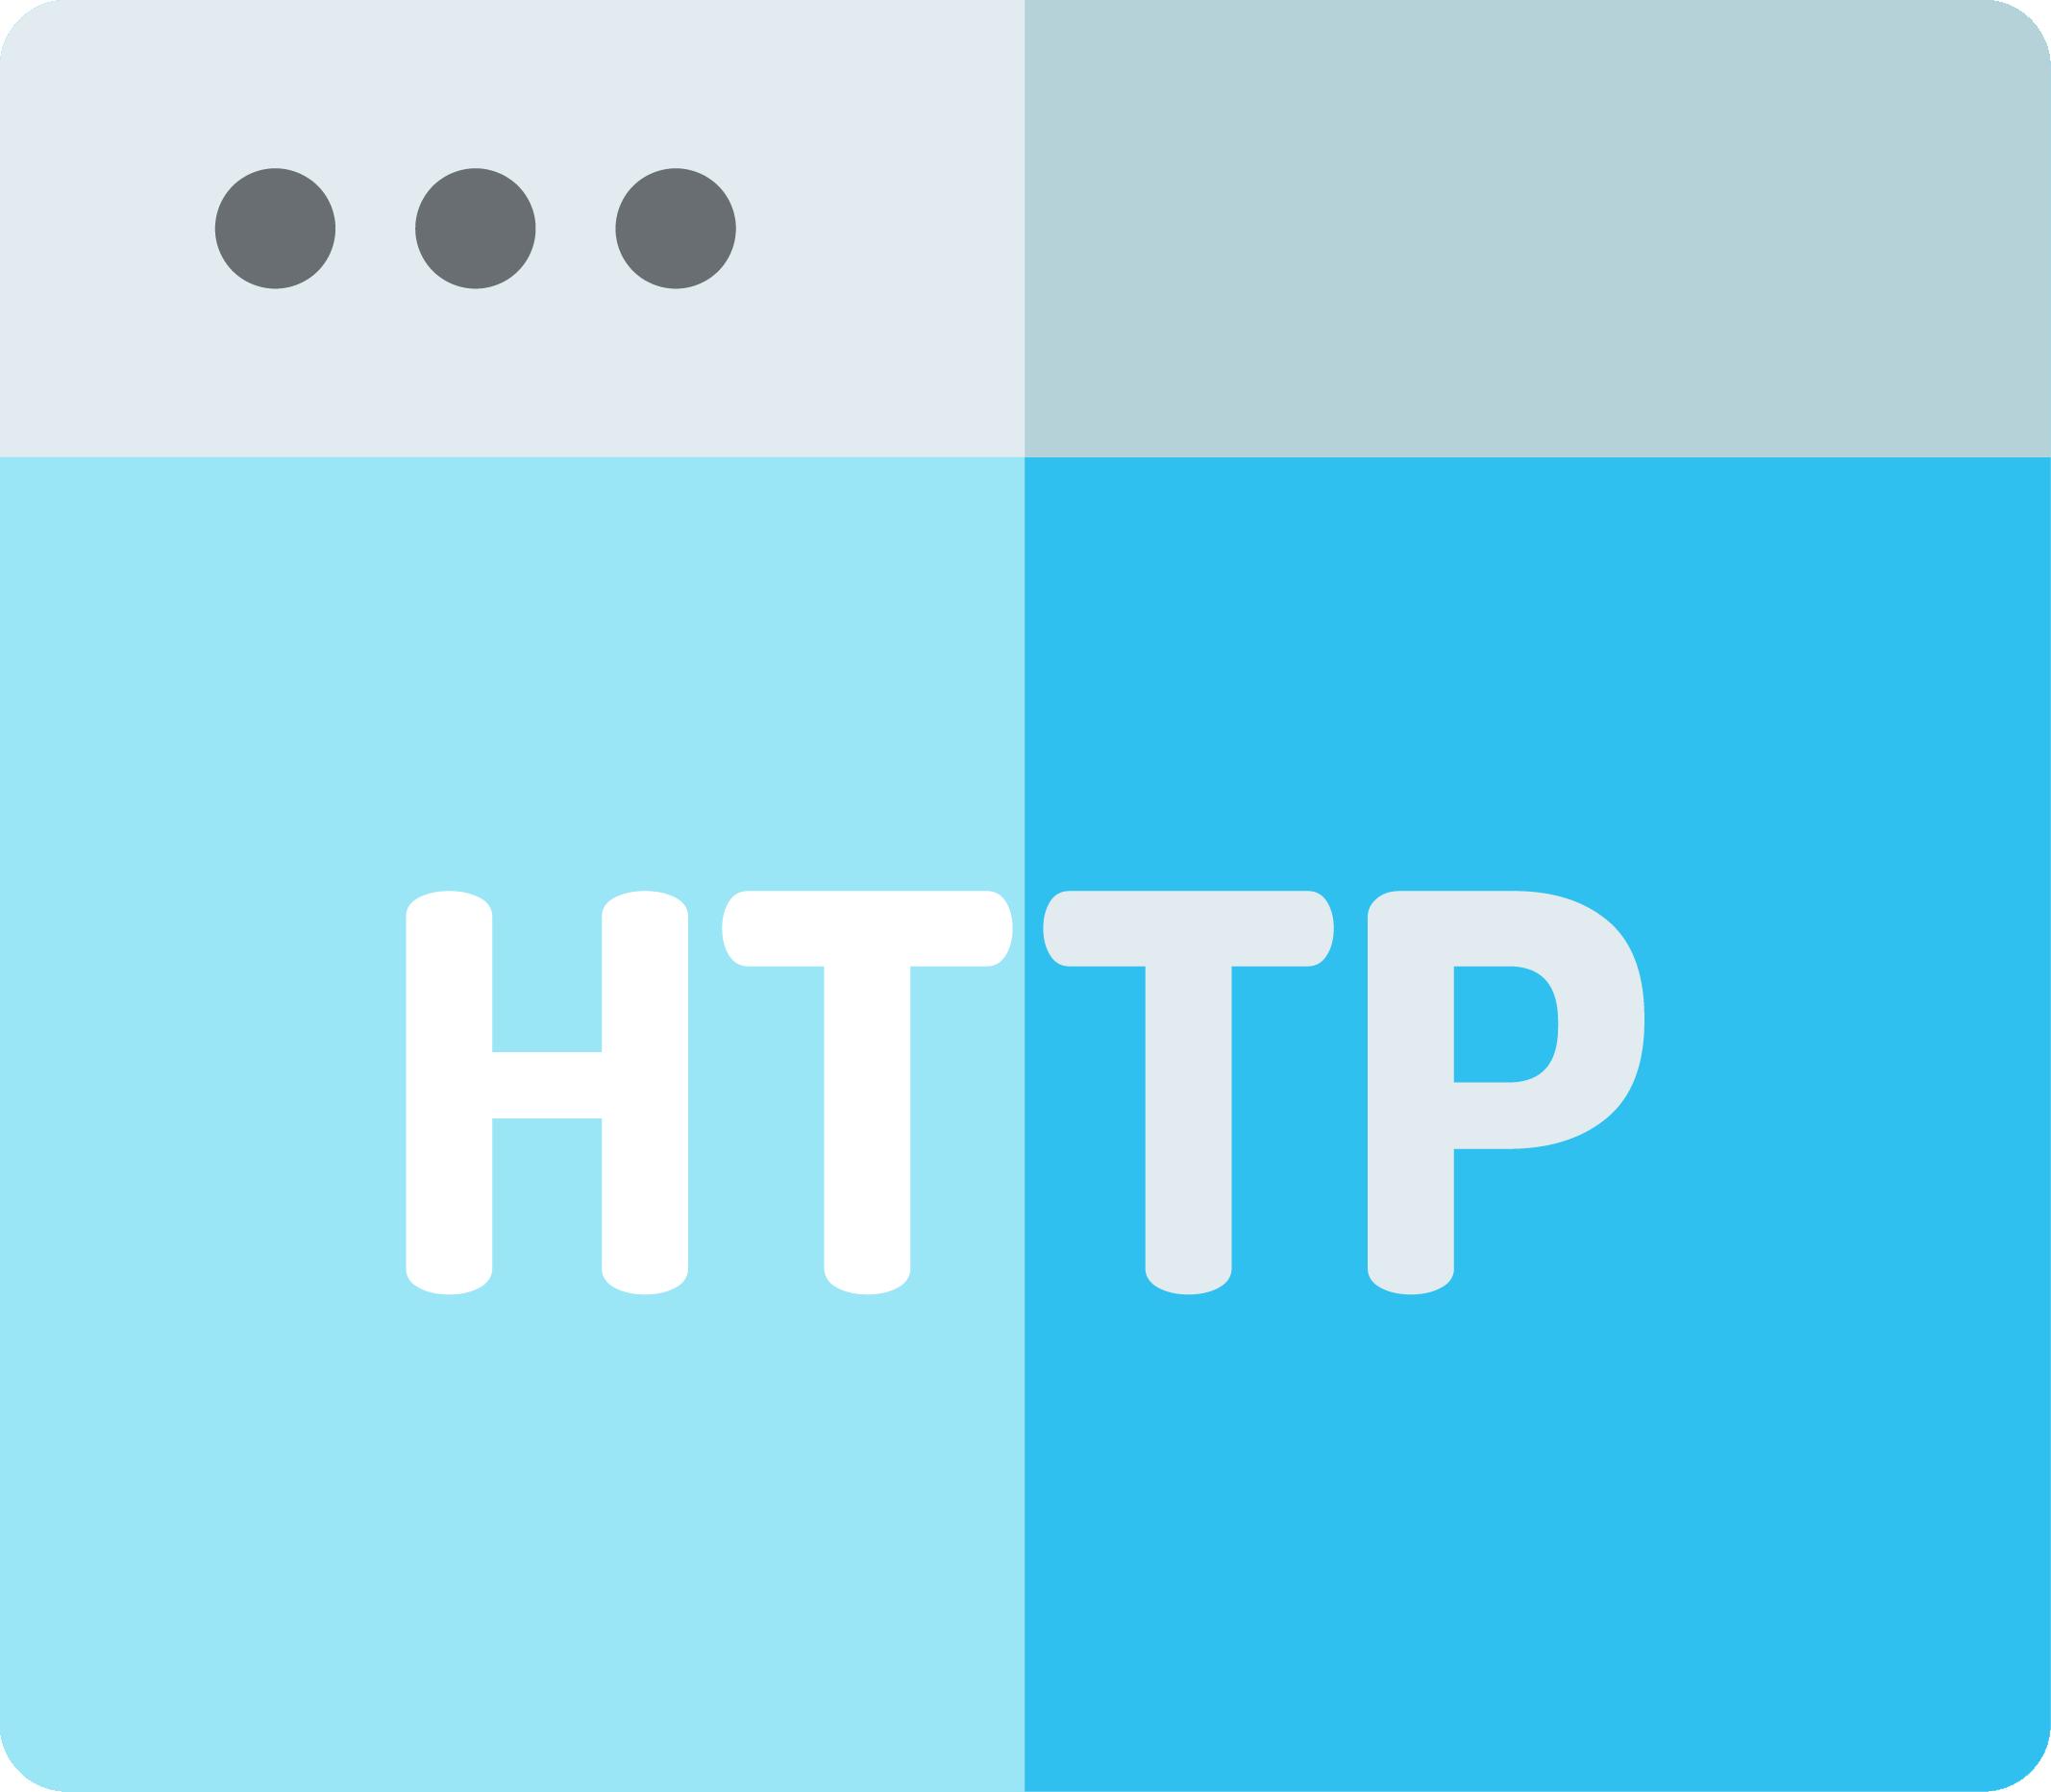 Extensibility via HTTP